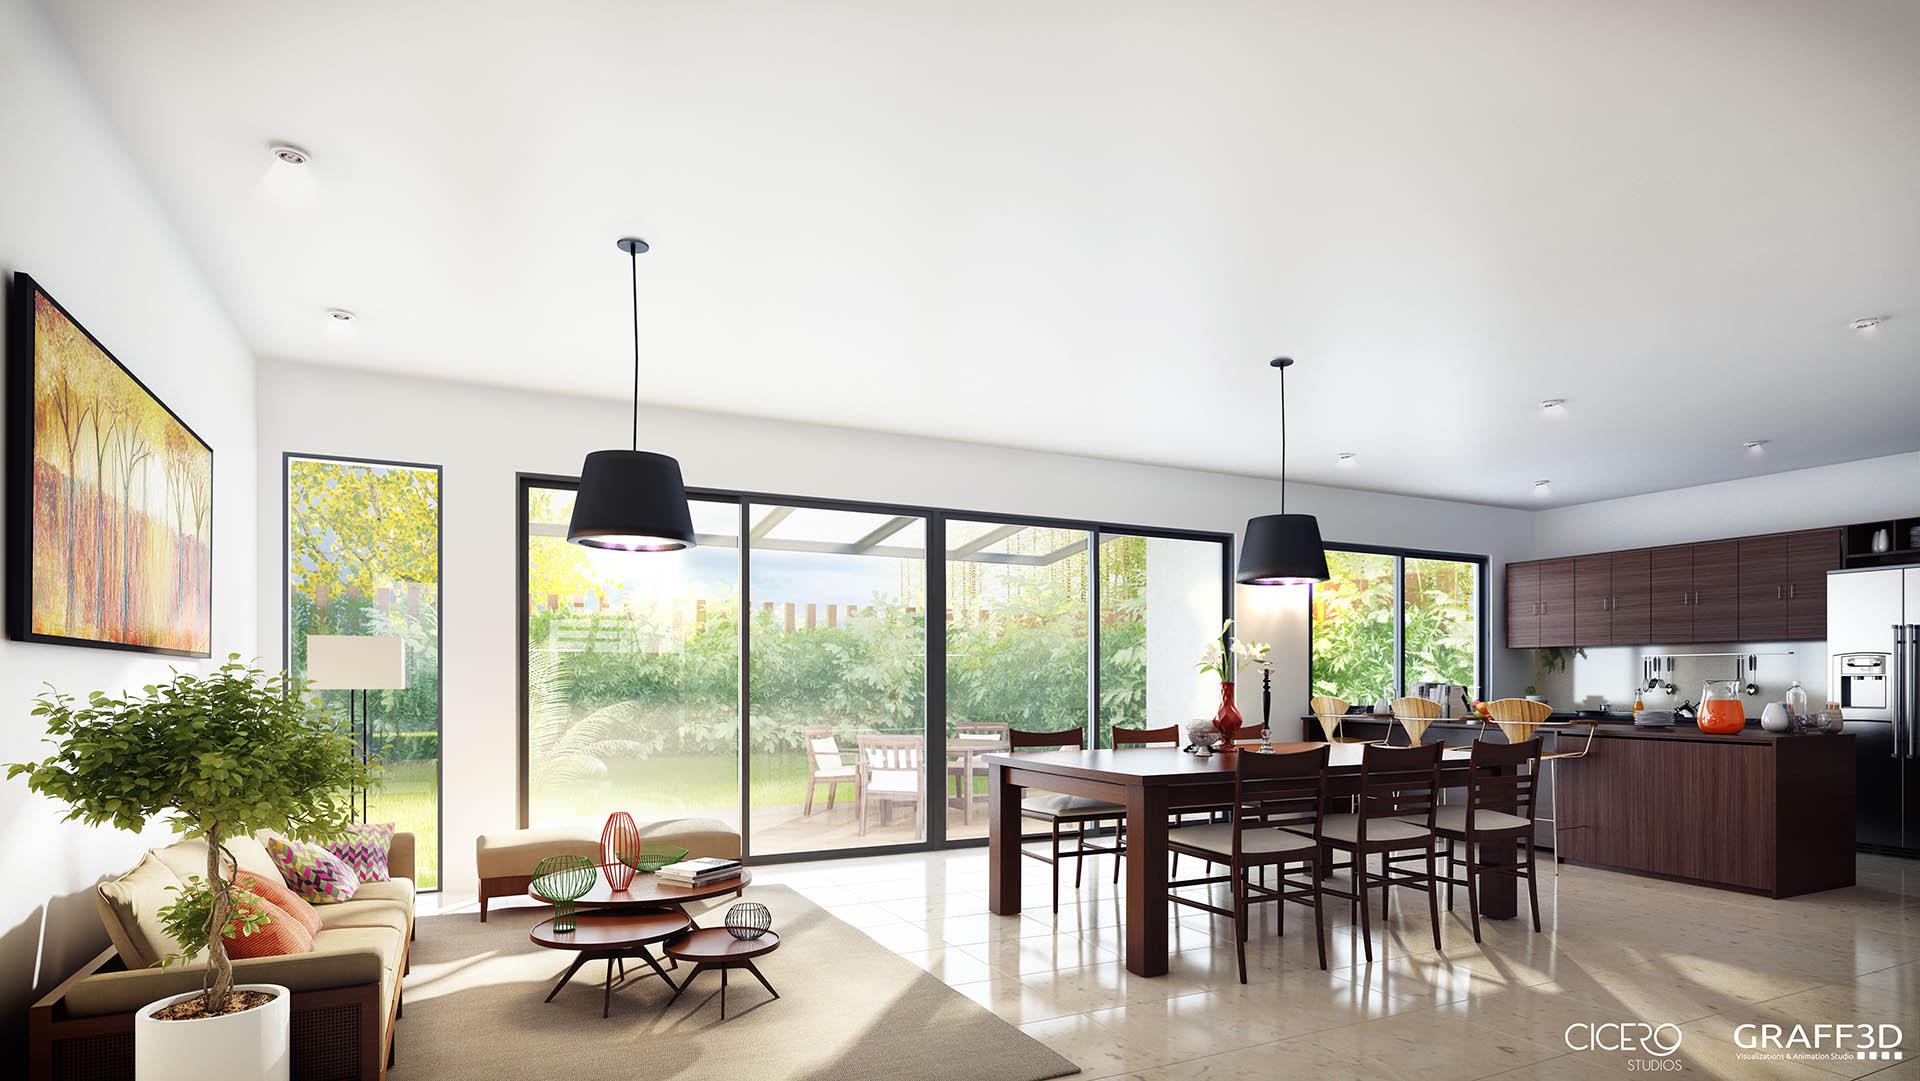 Interior_Living_Space_Rendering